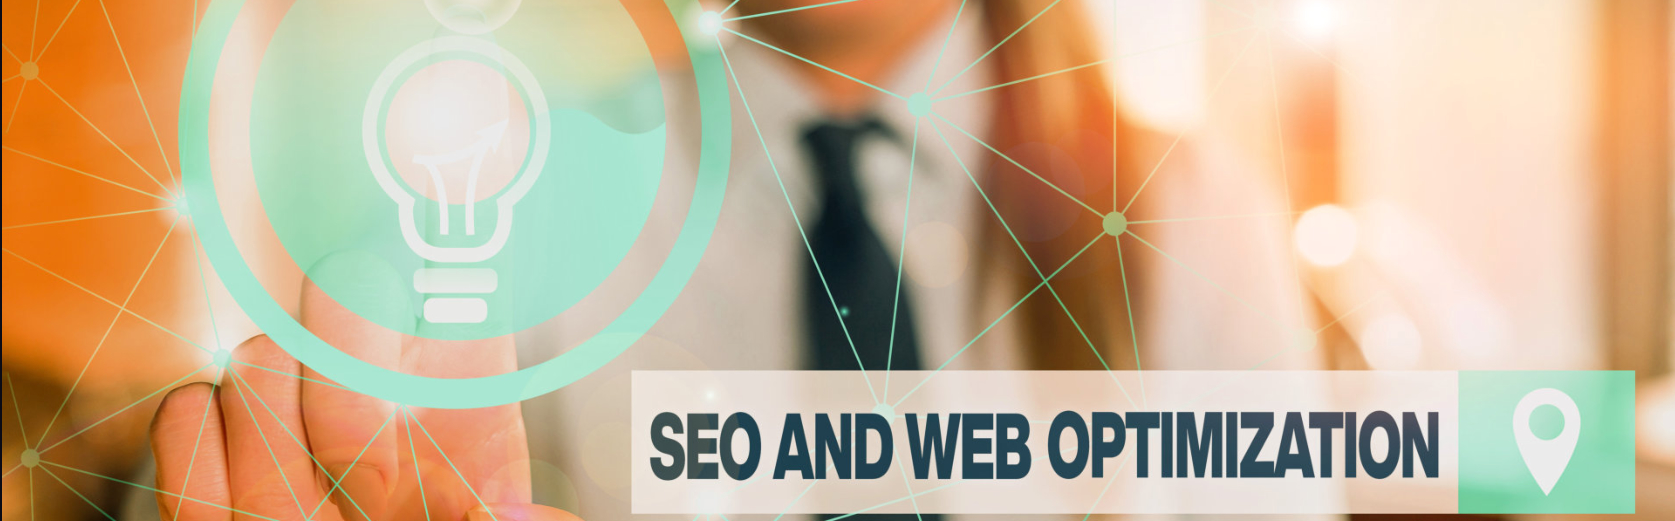 seo-and-web-optimization